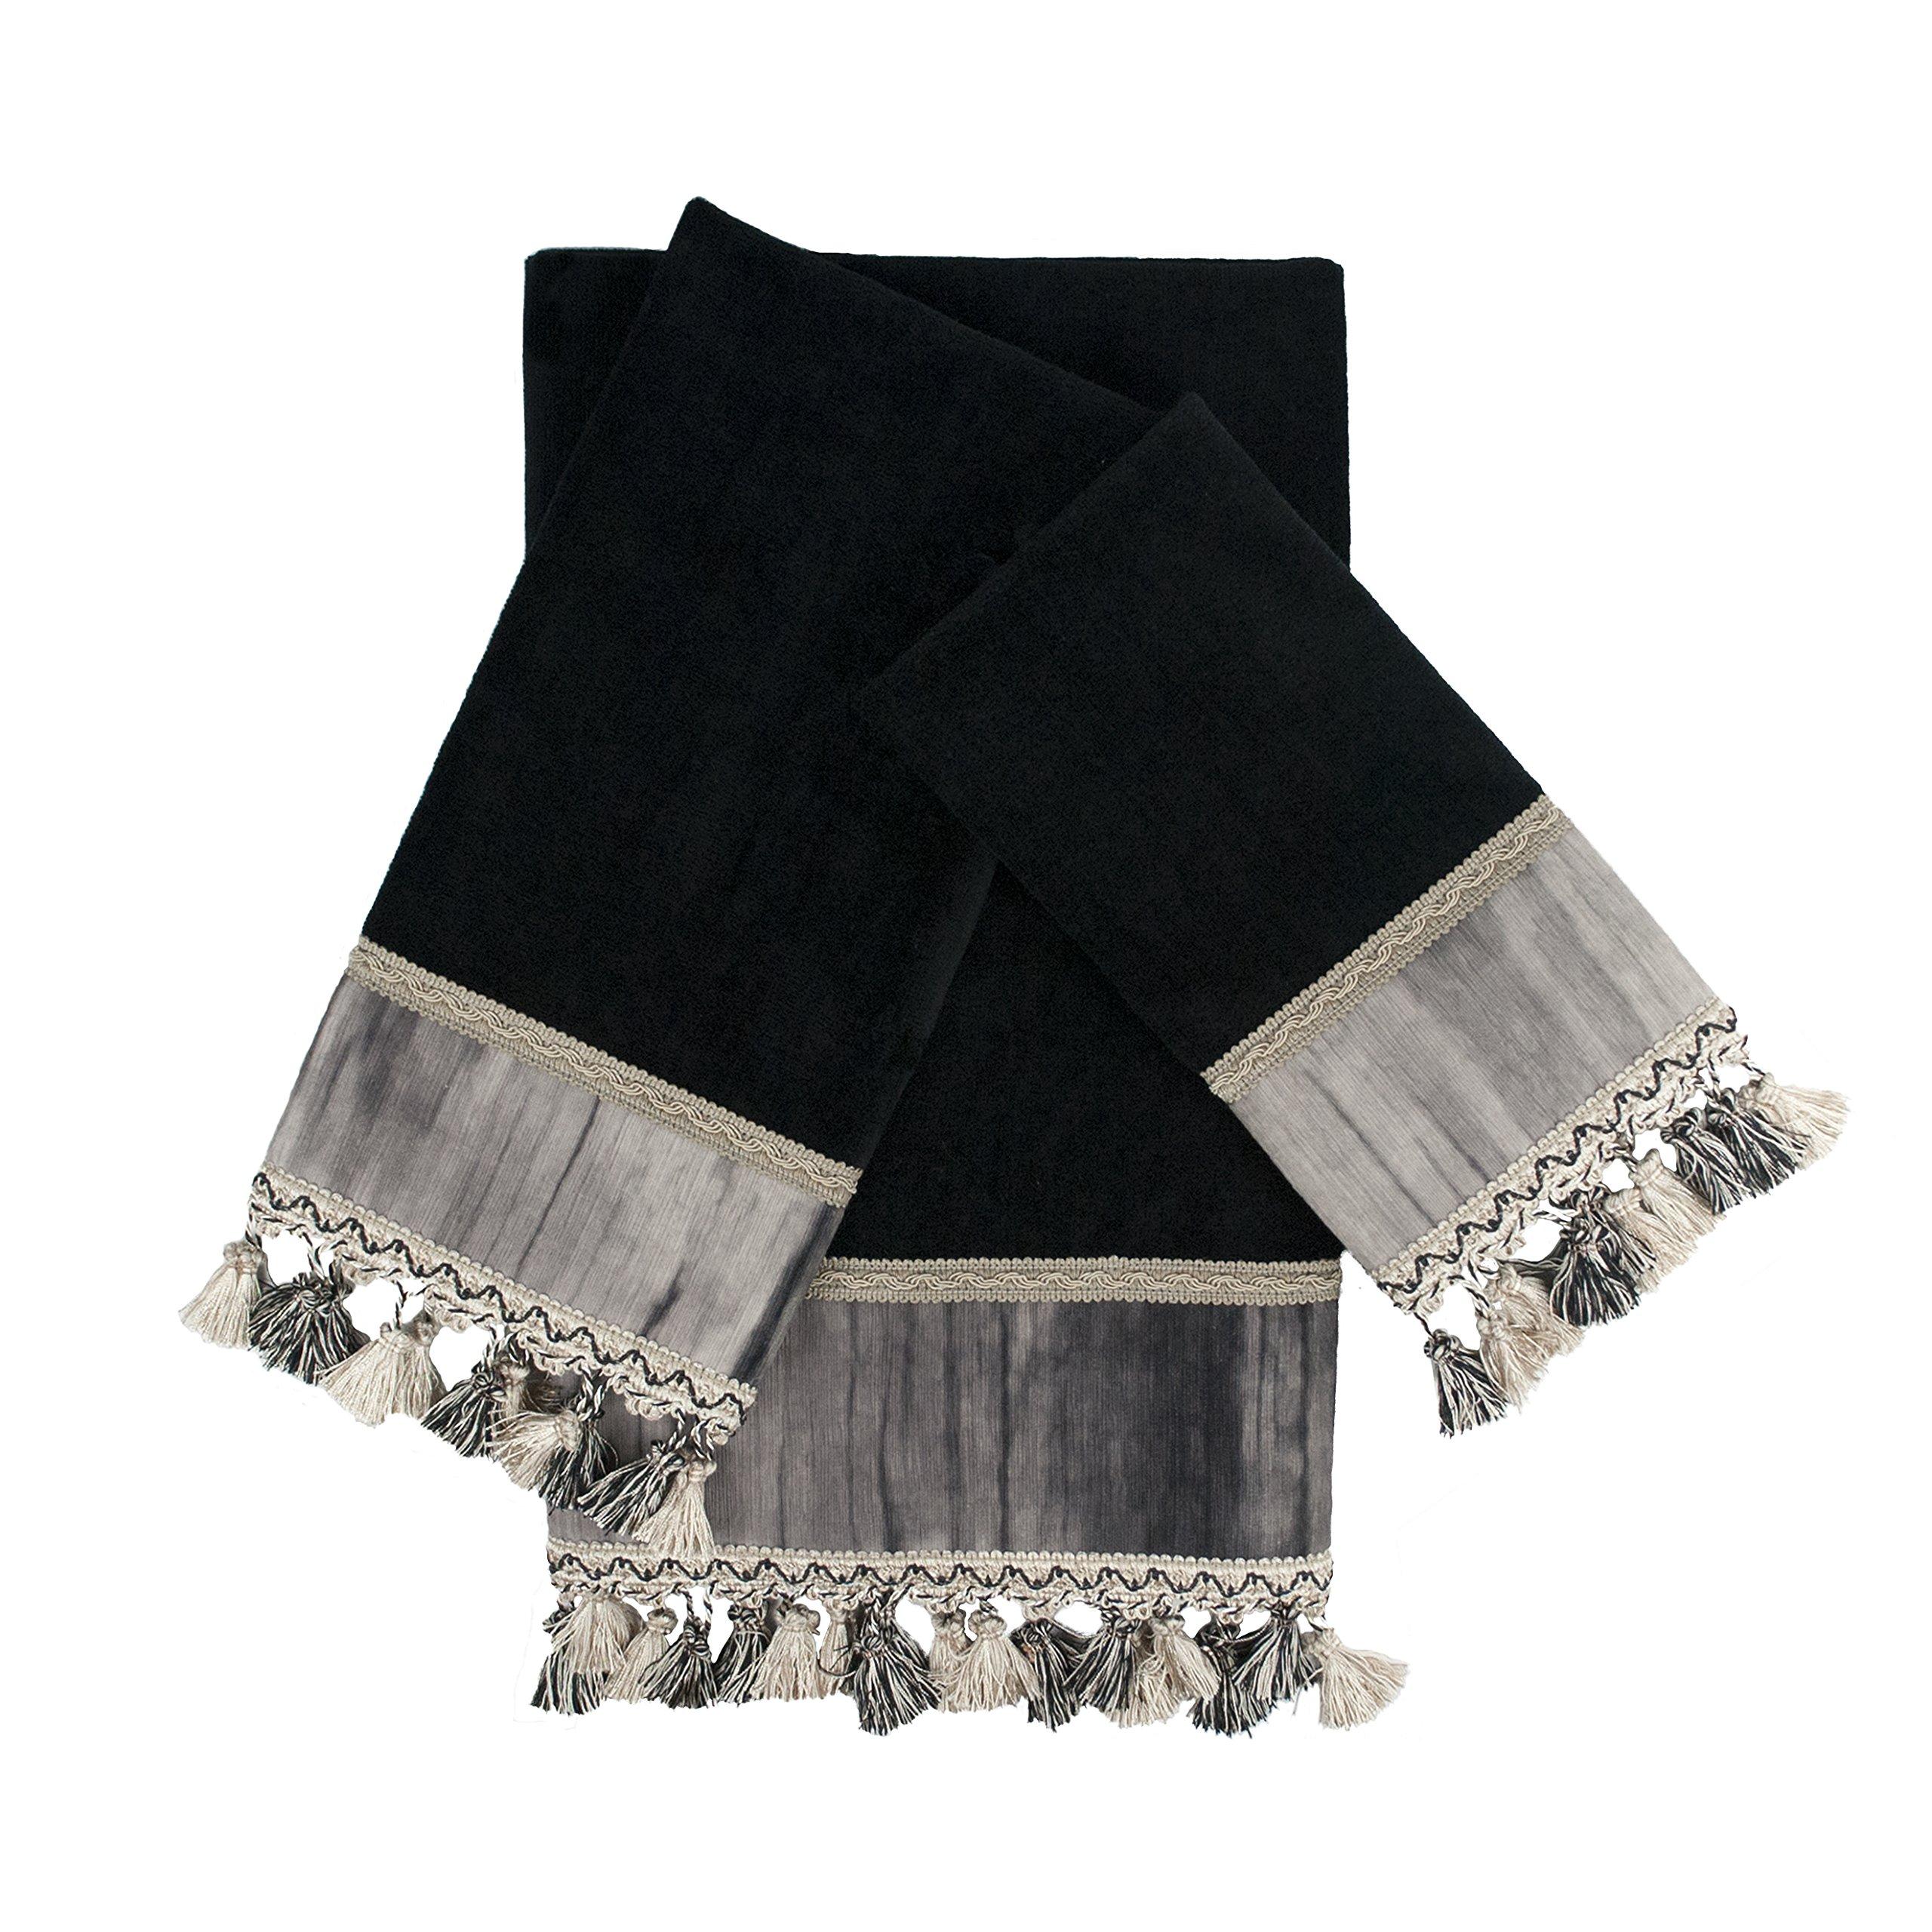 Sherry Kline Ambiance Black 3-Piece Embellished Set Decorative Towels,